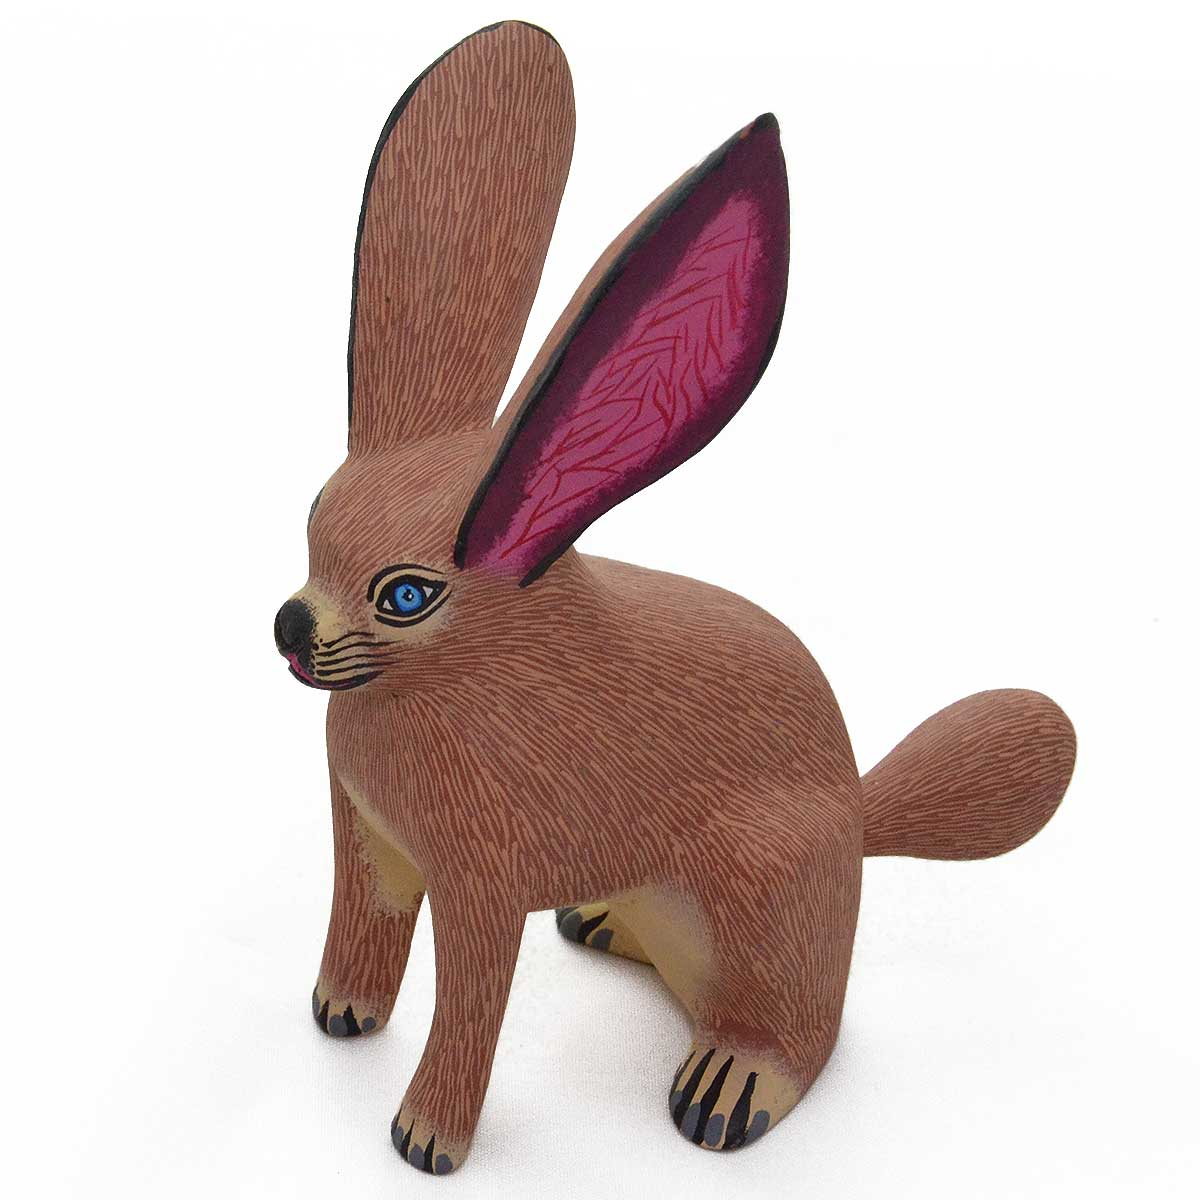 Eleazar Morales Eleazar Morales: Mini Rabbit Eleazar Morales